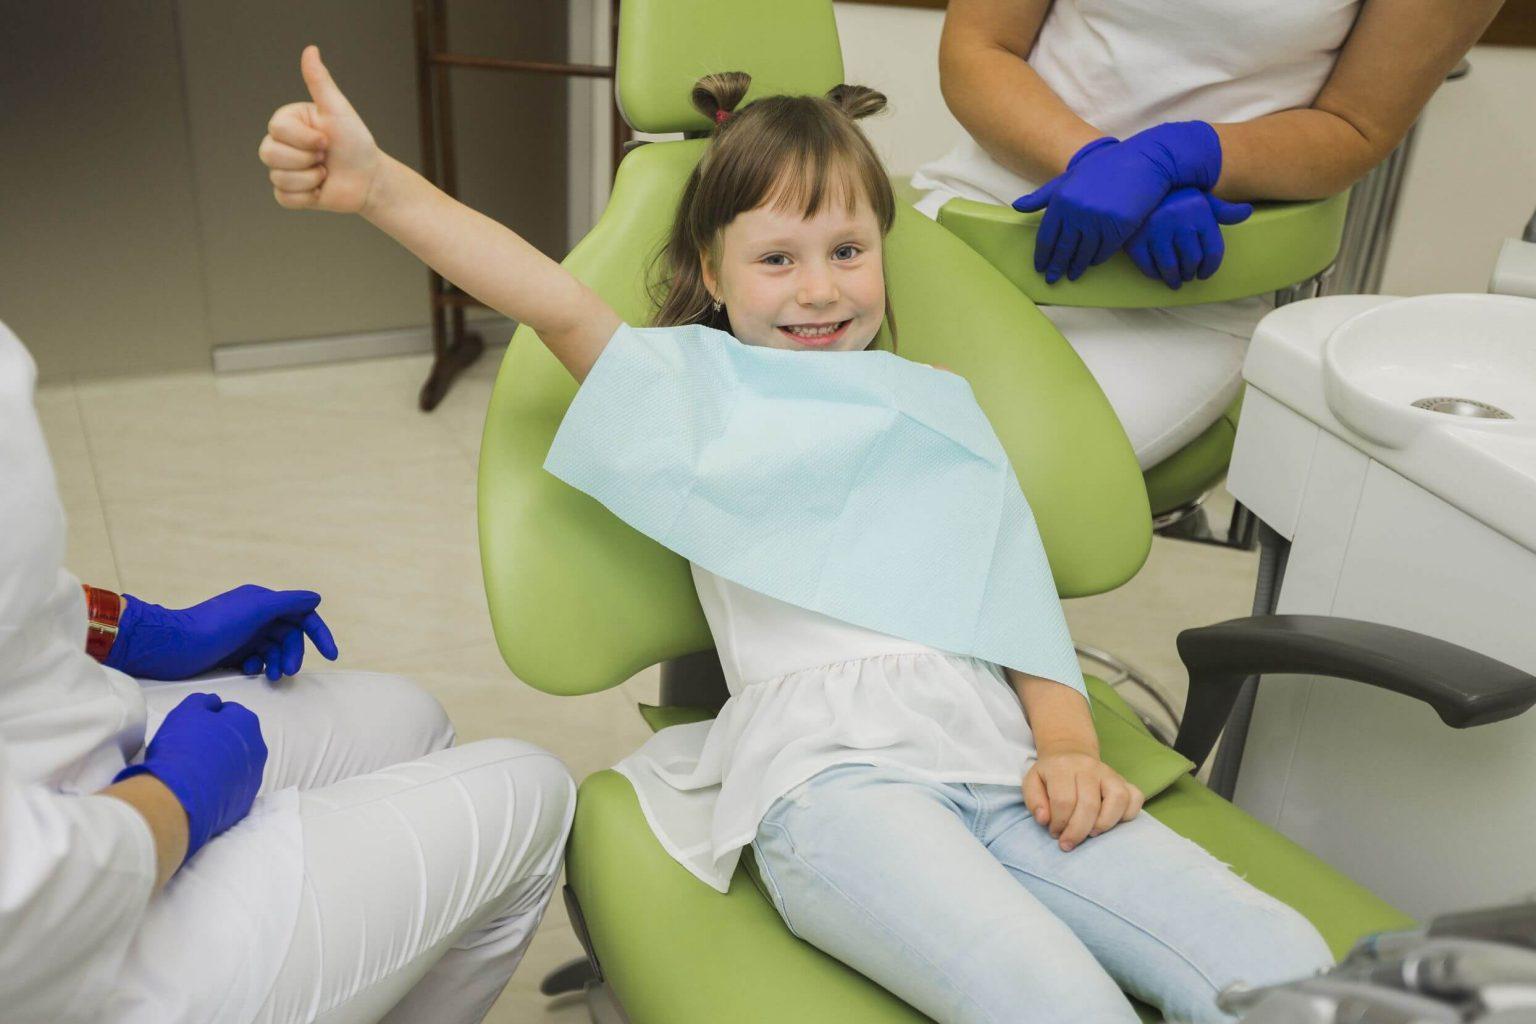 Children's Dentistry At Alpenglow Dental In Bend, Oregon